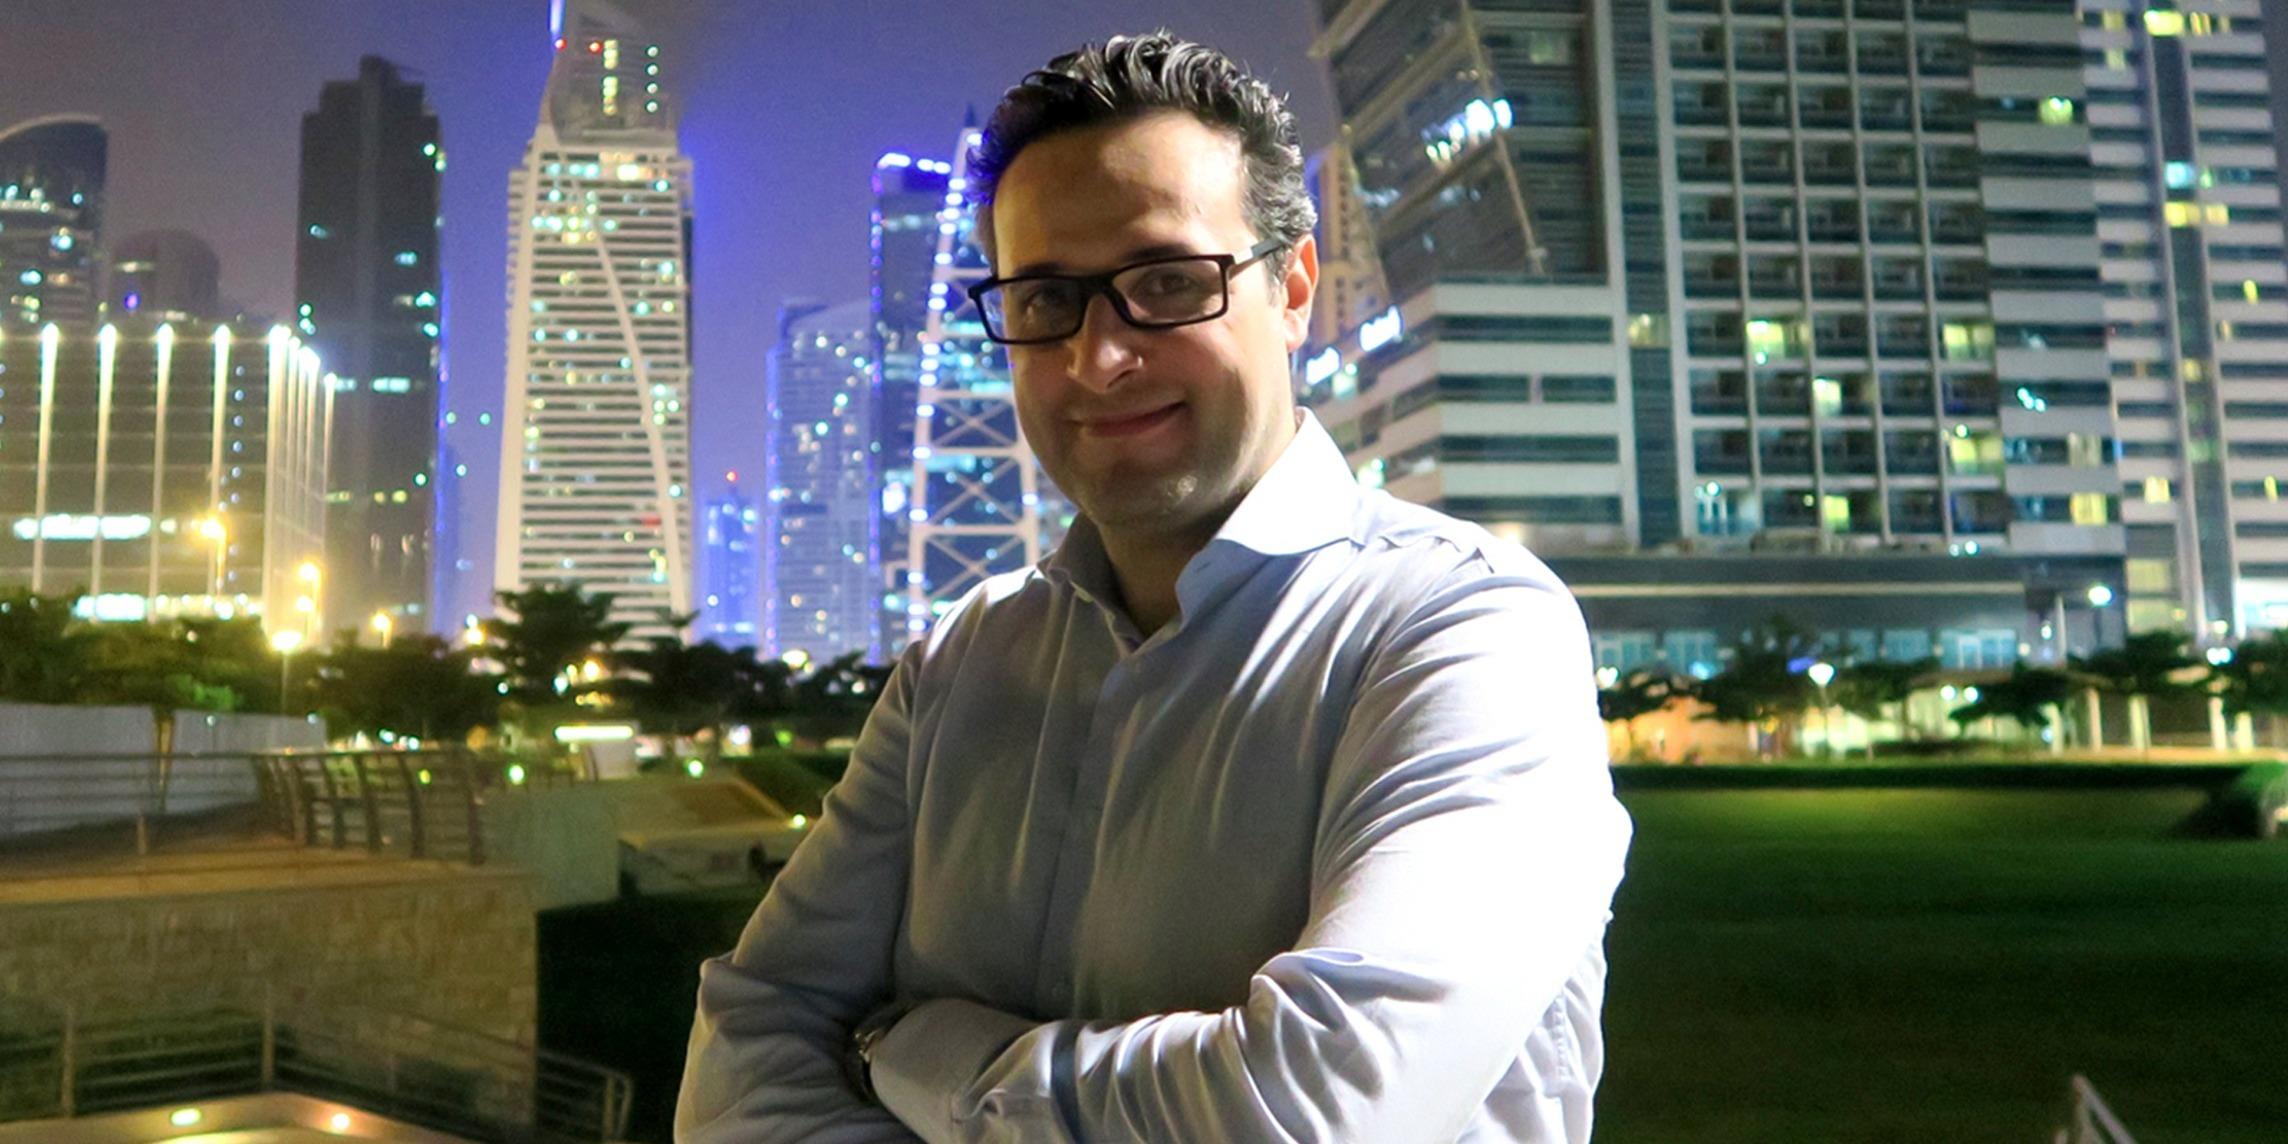 Thami thami Thami Kabbaj : +534 $ en 7 minutes Live Trading devant 85 personnes ! tkl